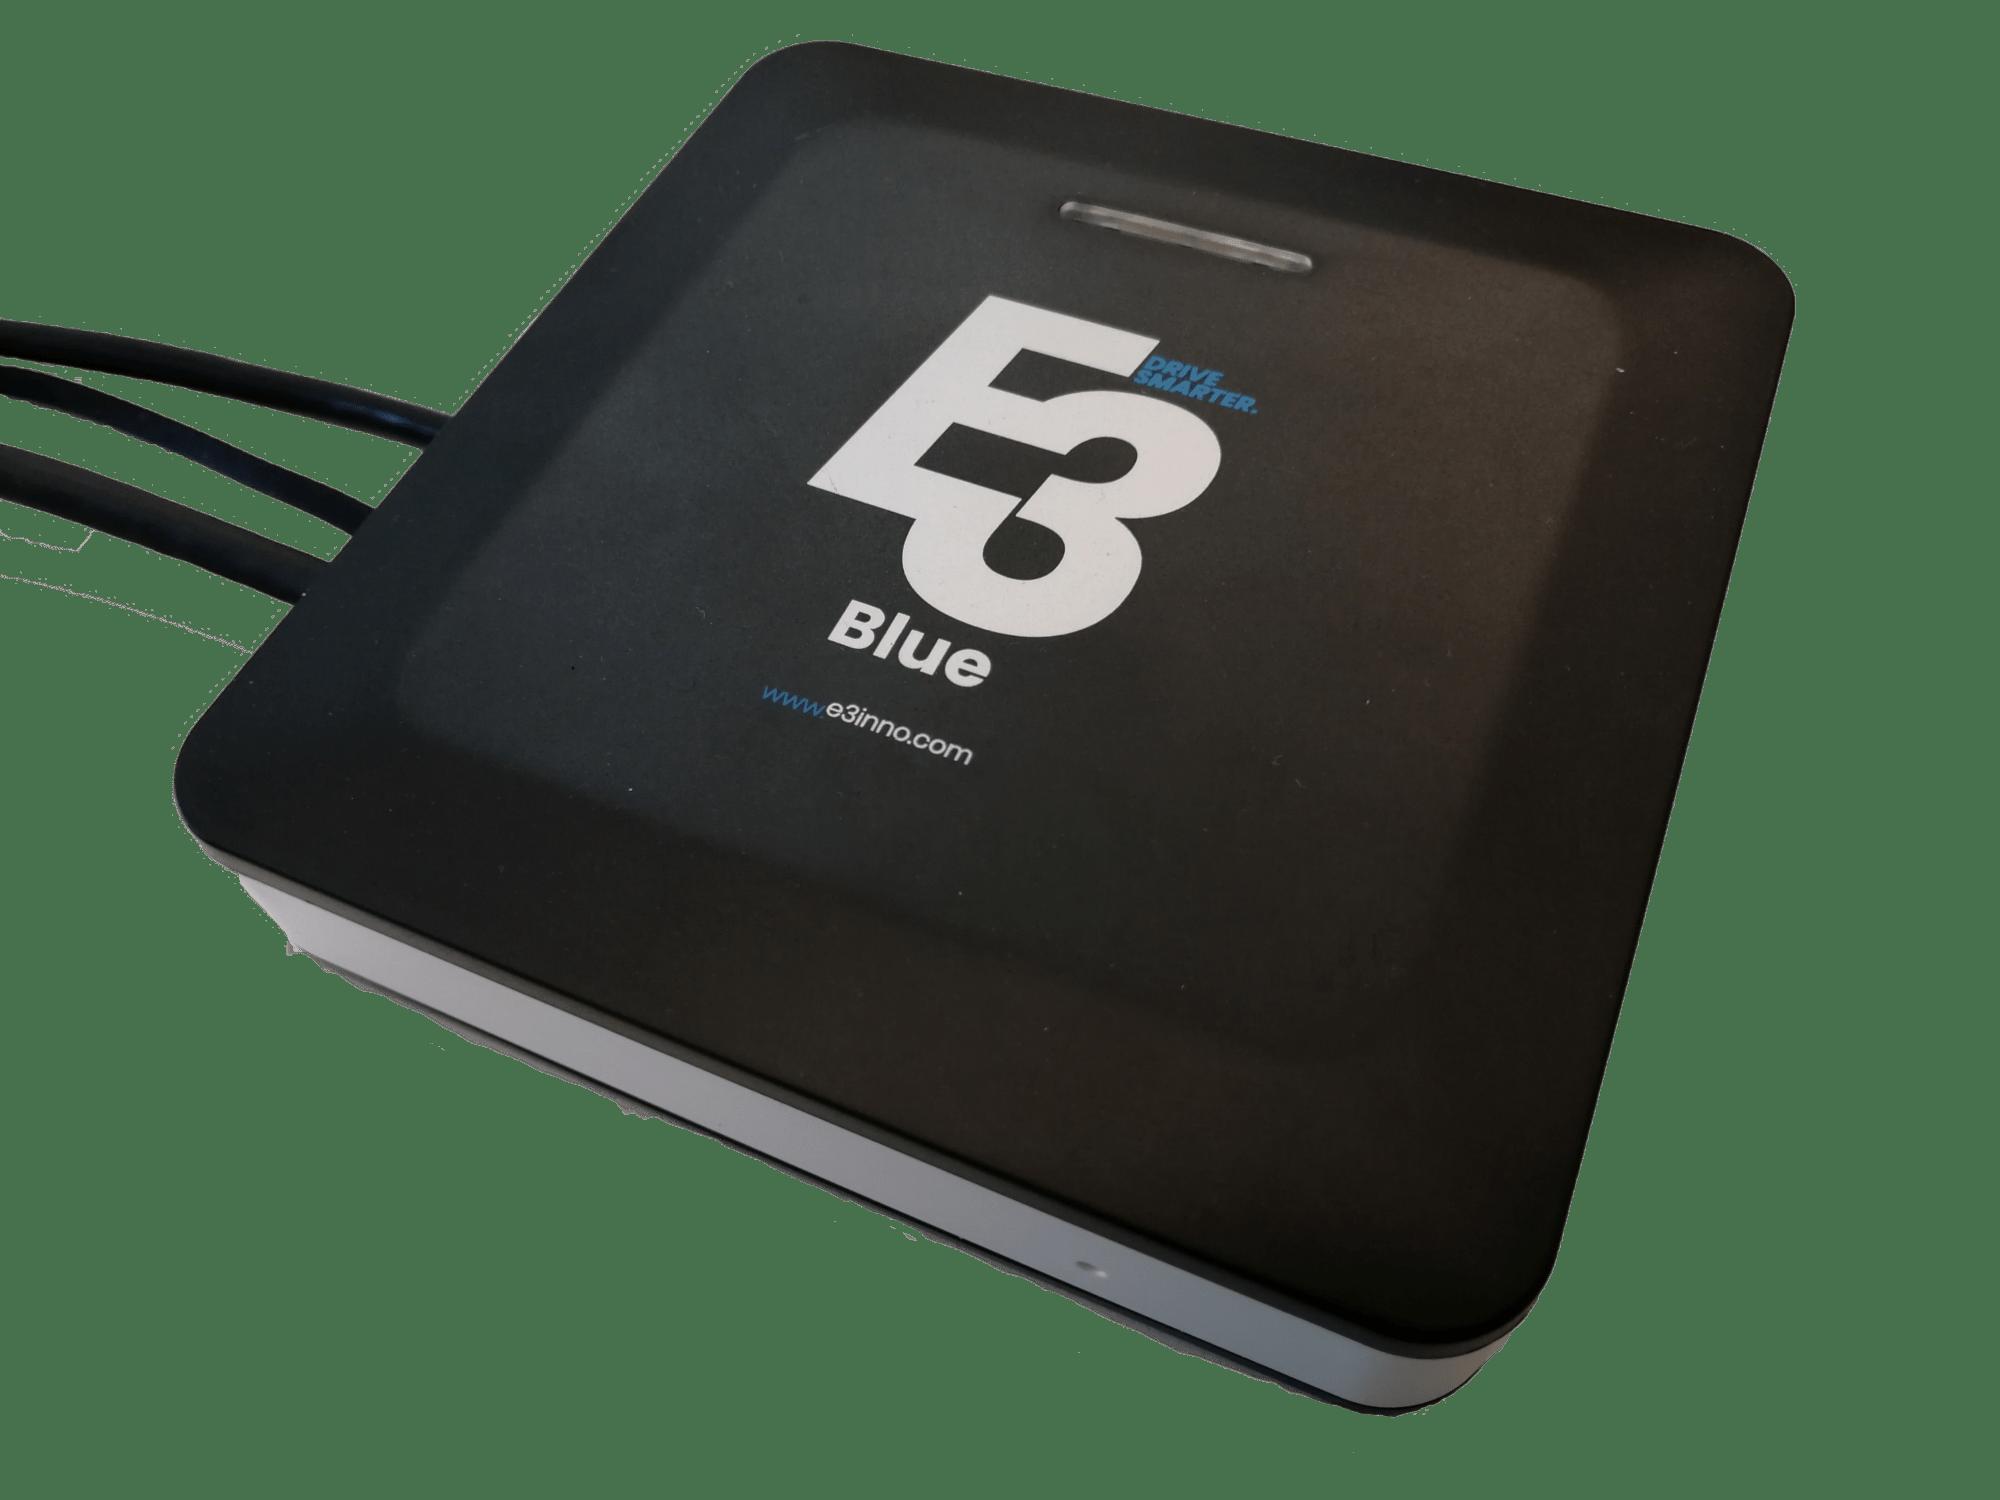 E3 Box product image